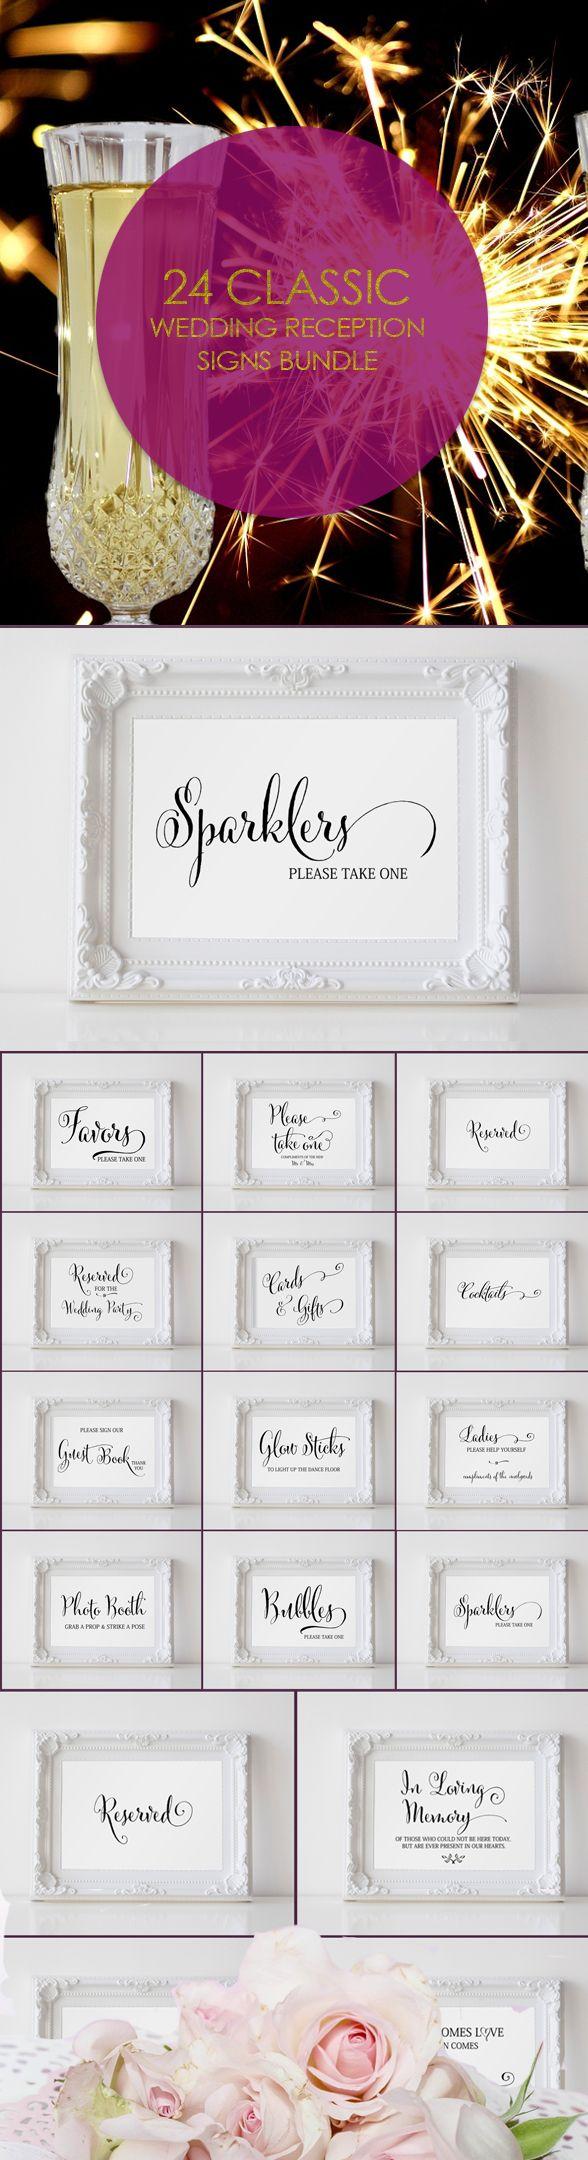 Sparklers wedding favor sign Part of the